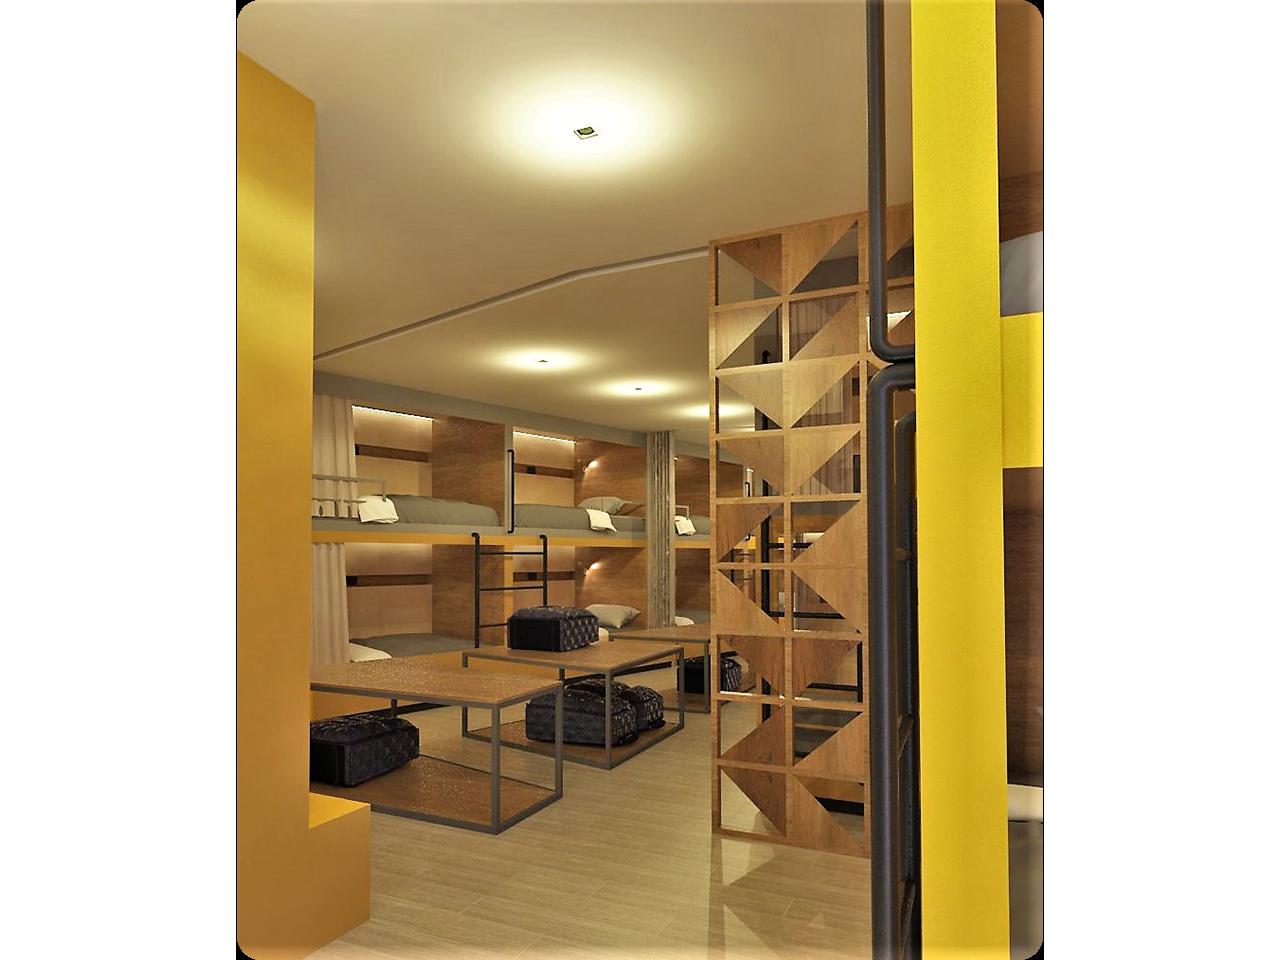 inside photo of yello hotel dormitel